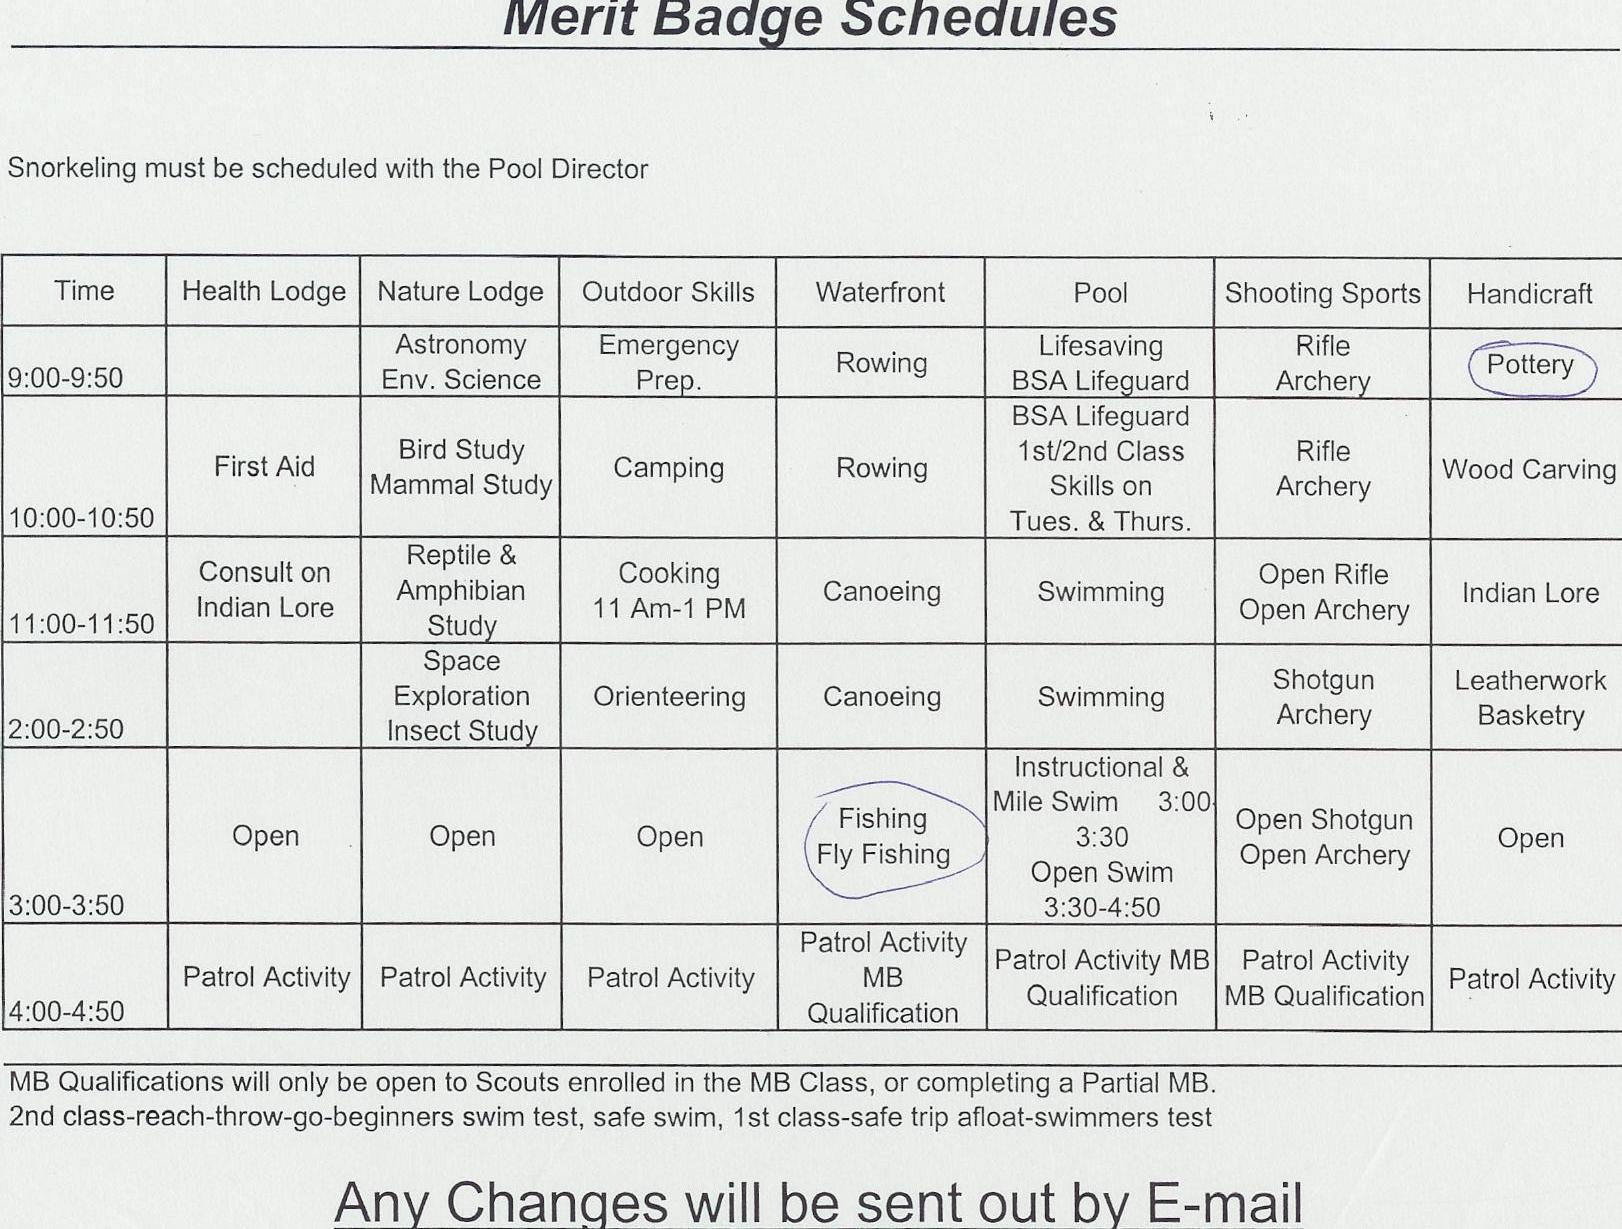 Seven Mountains Summer Camp 2004 Merit Badge Schedule